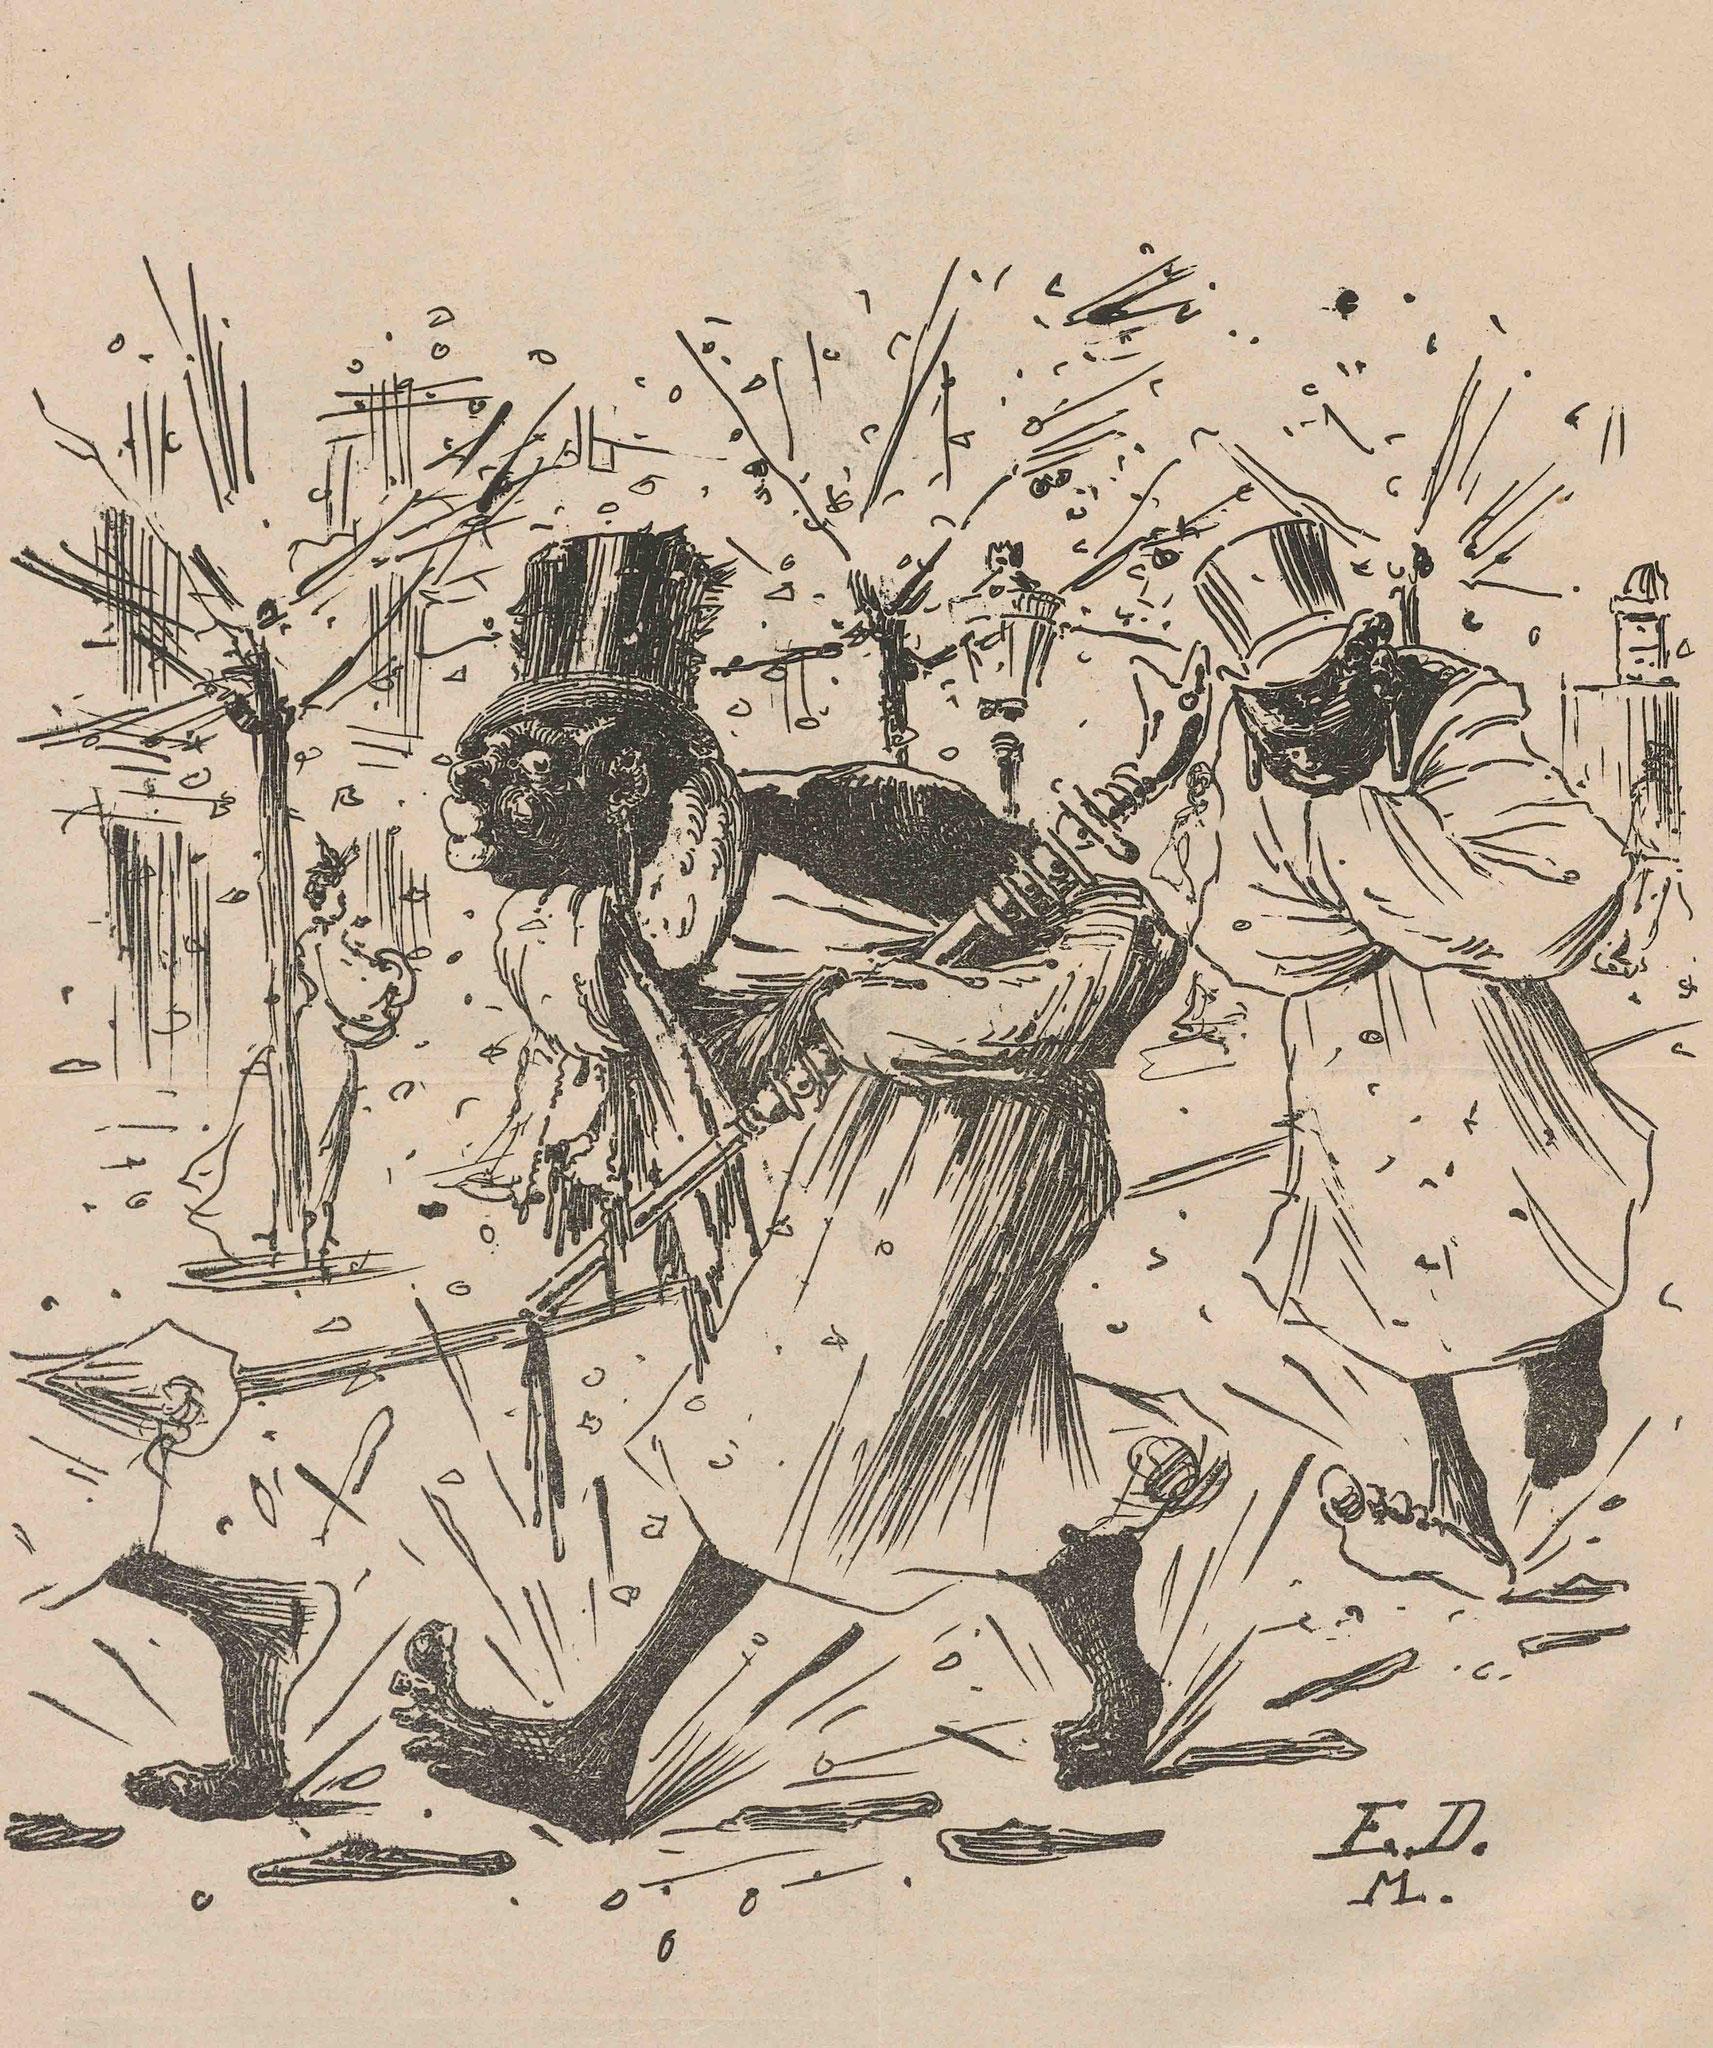 Nebelspalter-Illustration, 1893